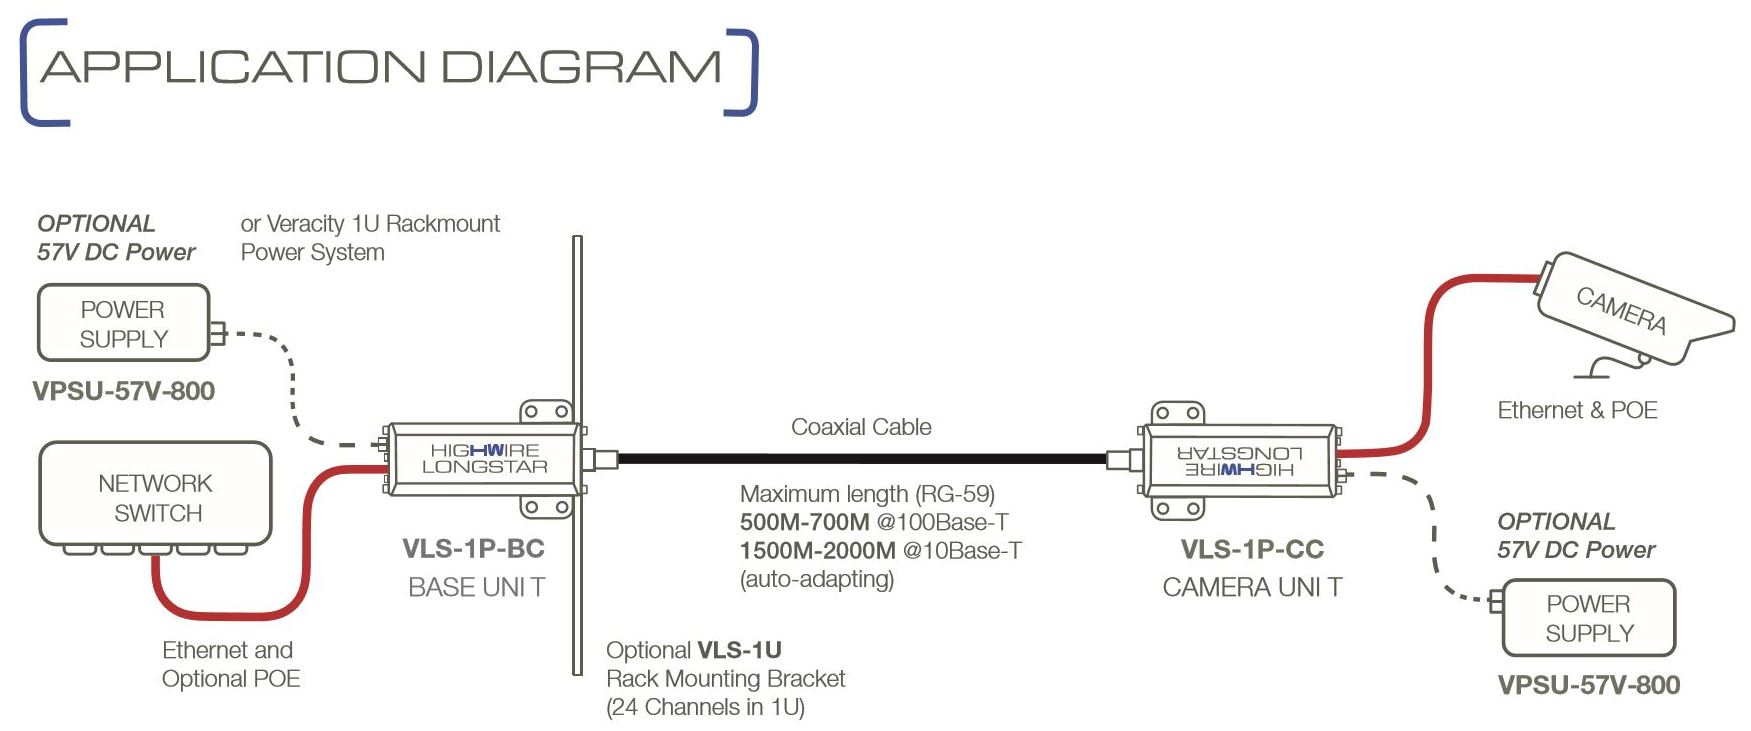 hight resolution of veracity highwire longstar layout